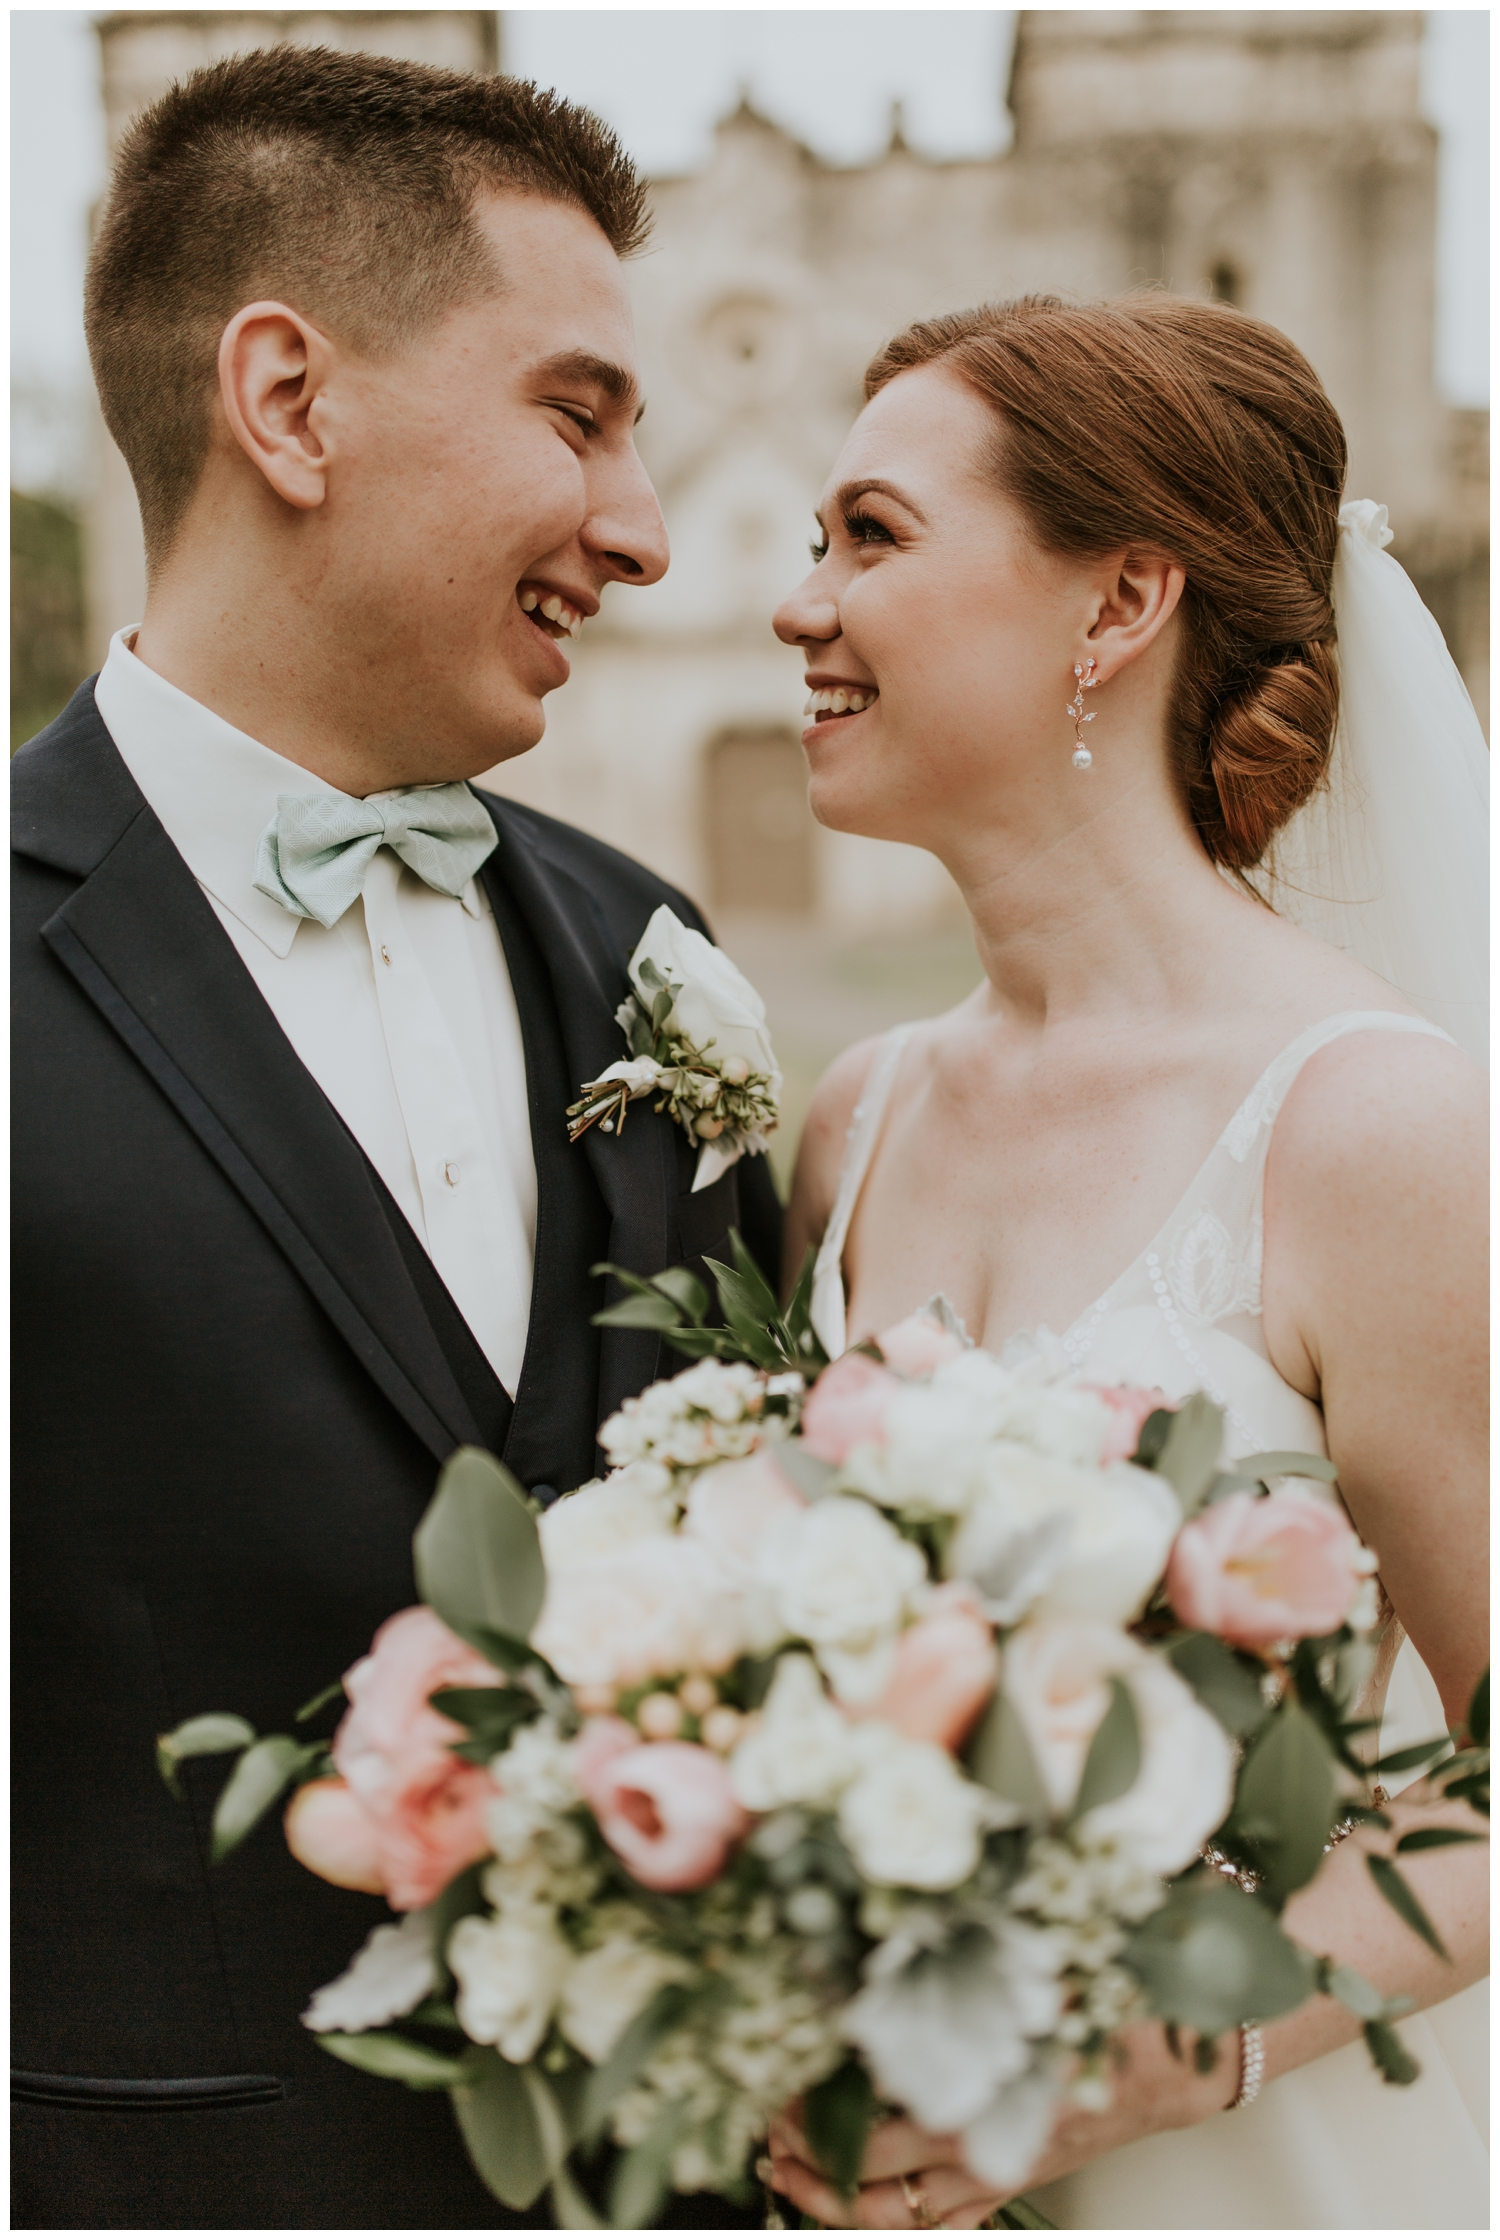 Jenna+Brandon, Mission Concepcion Wedding, San Antonio, Contista Productions Wedding Photography_0072.jpg